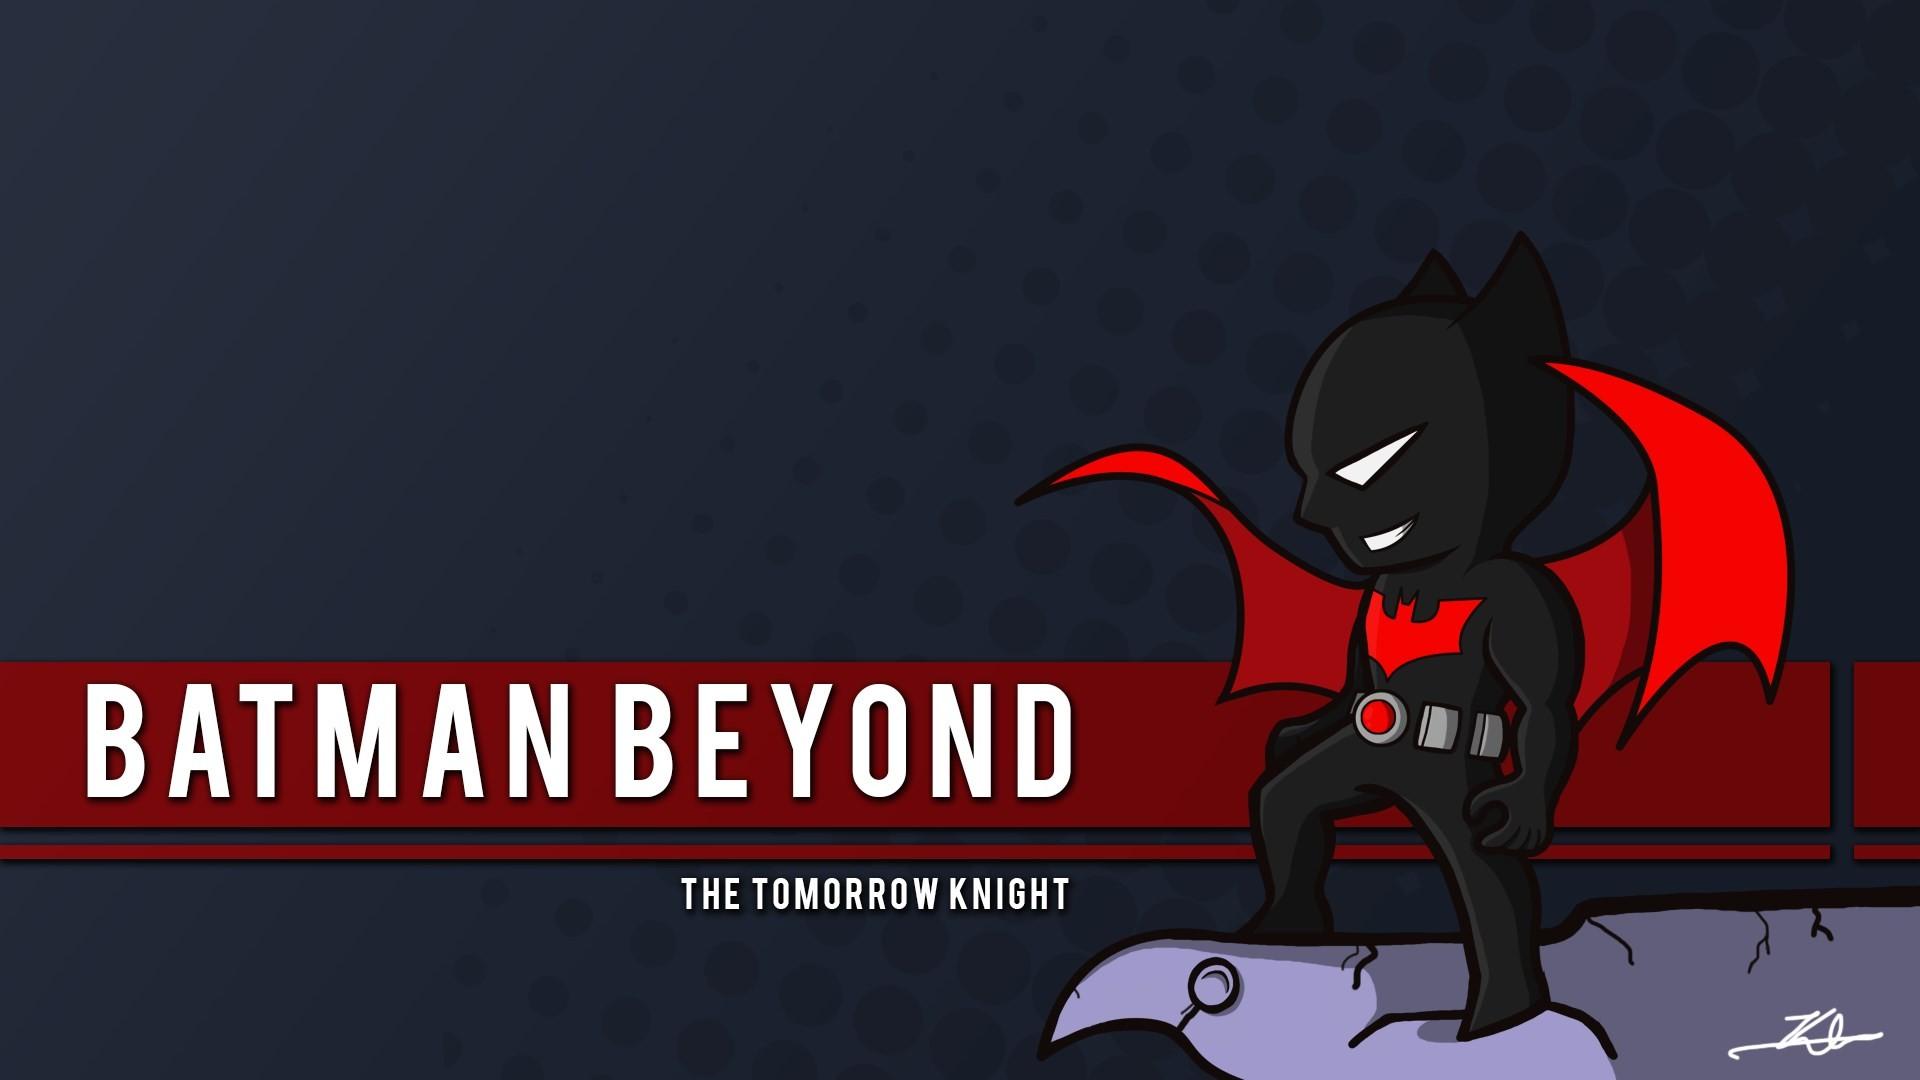 #1503008, batman beyond category – Widescreen Wallpapers: batman beyond  picture